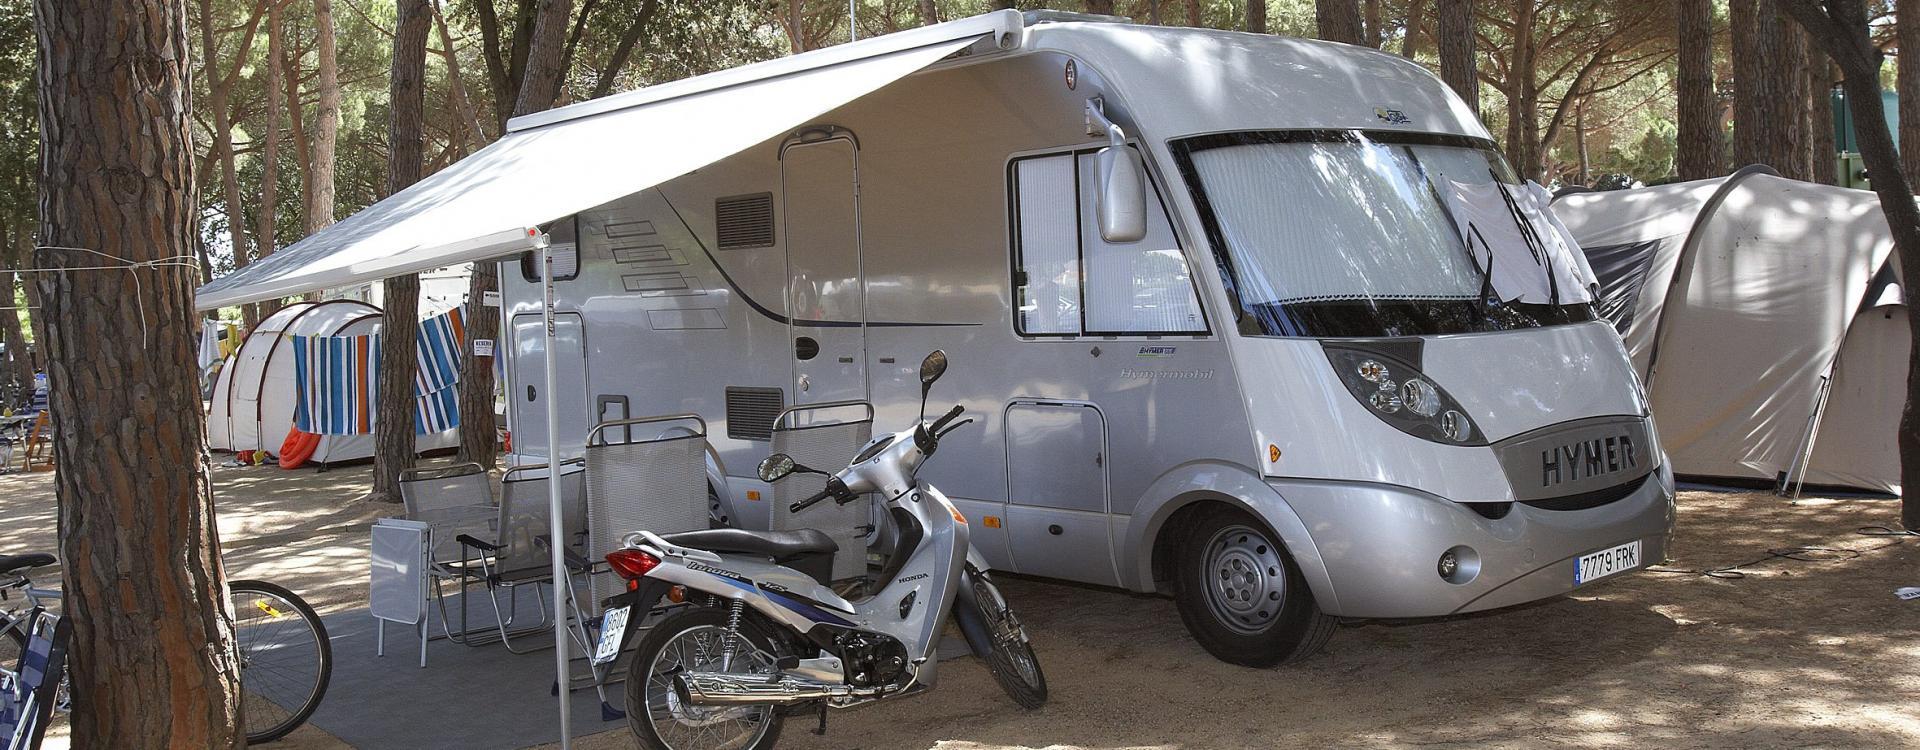 optimitzades/parcelles/pernocta/parcela-sombra-autocaravana-camping-valldaro.jpg